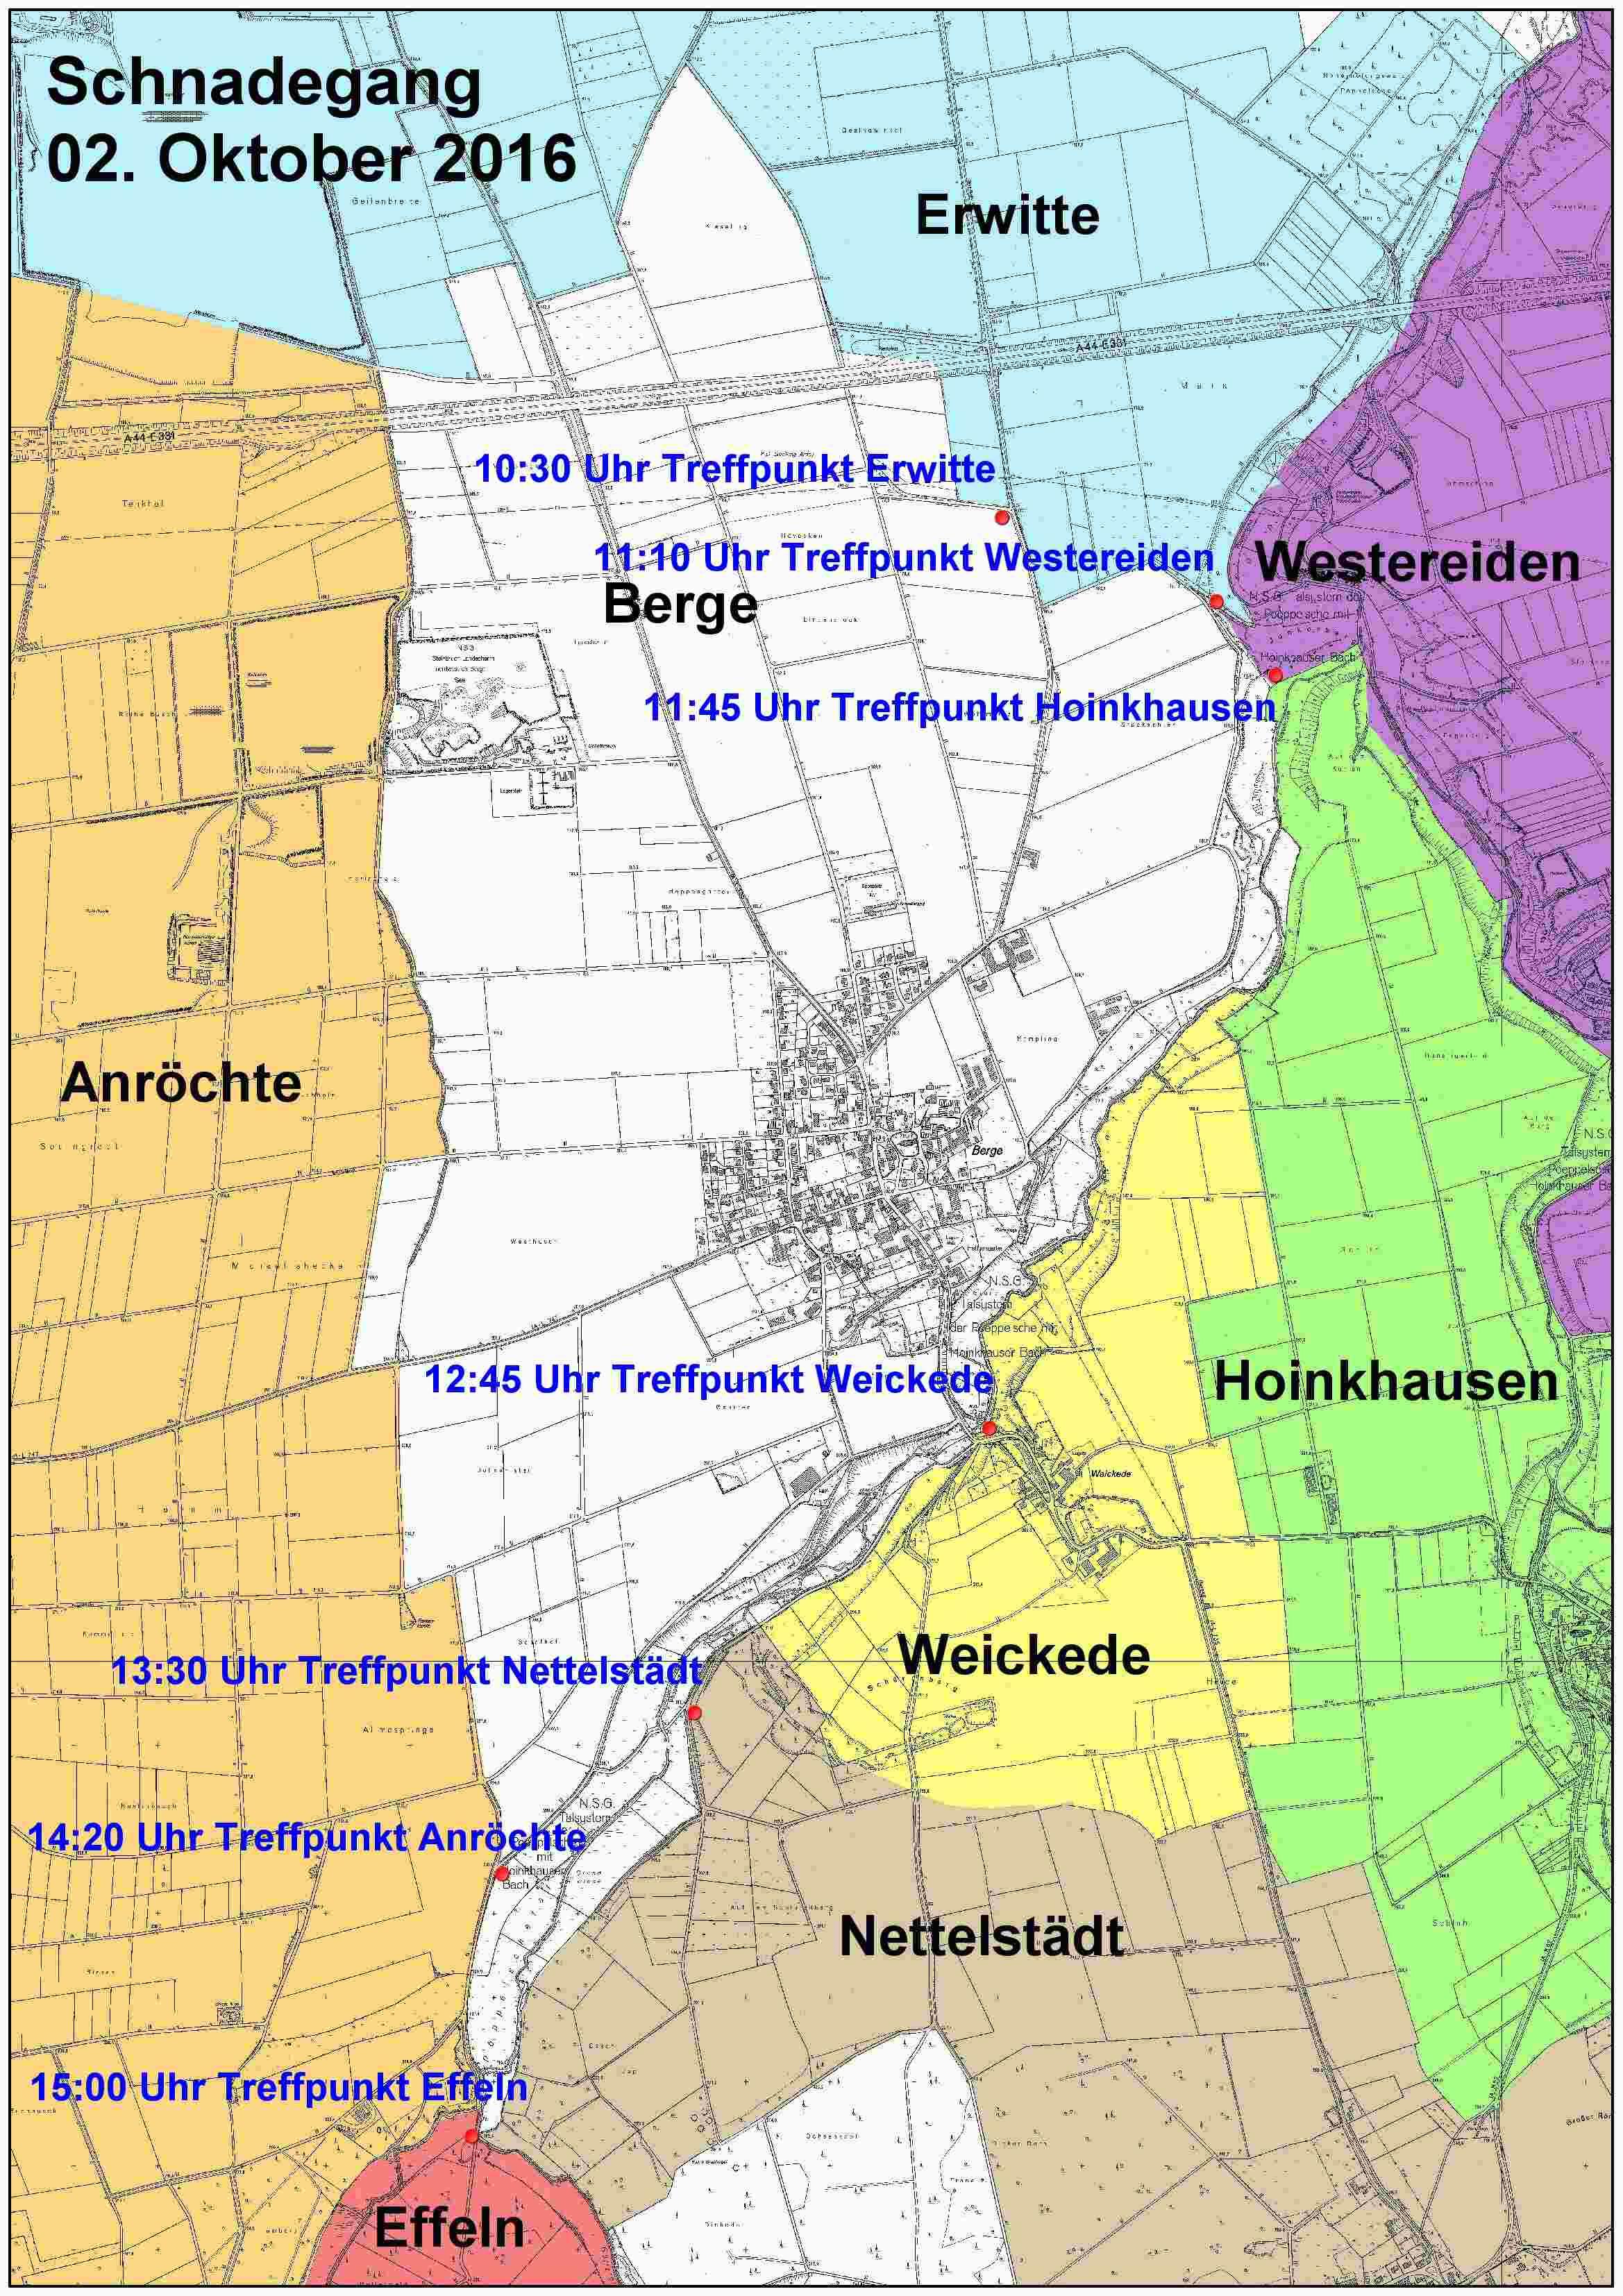 SchnadegangStrecke-02-10-2016.jpg - 499.87 kB